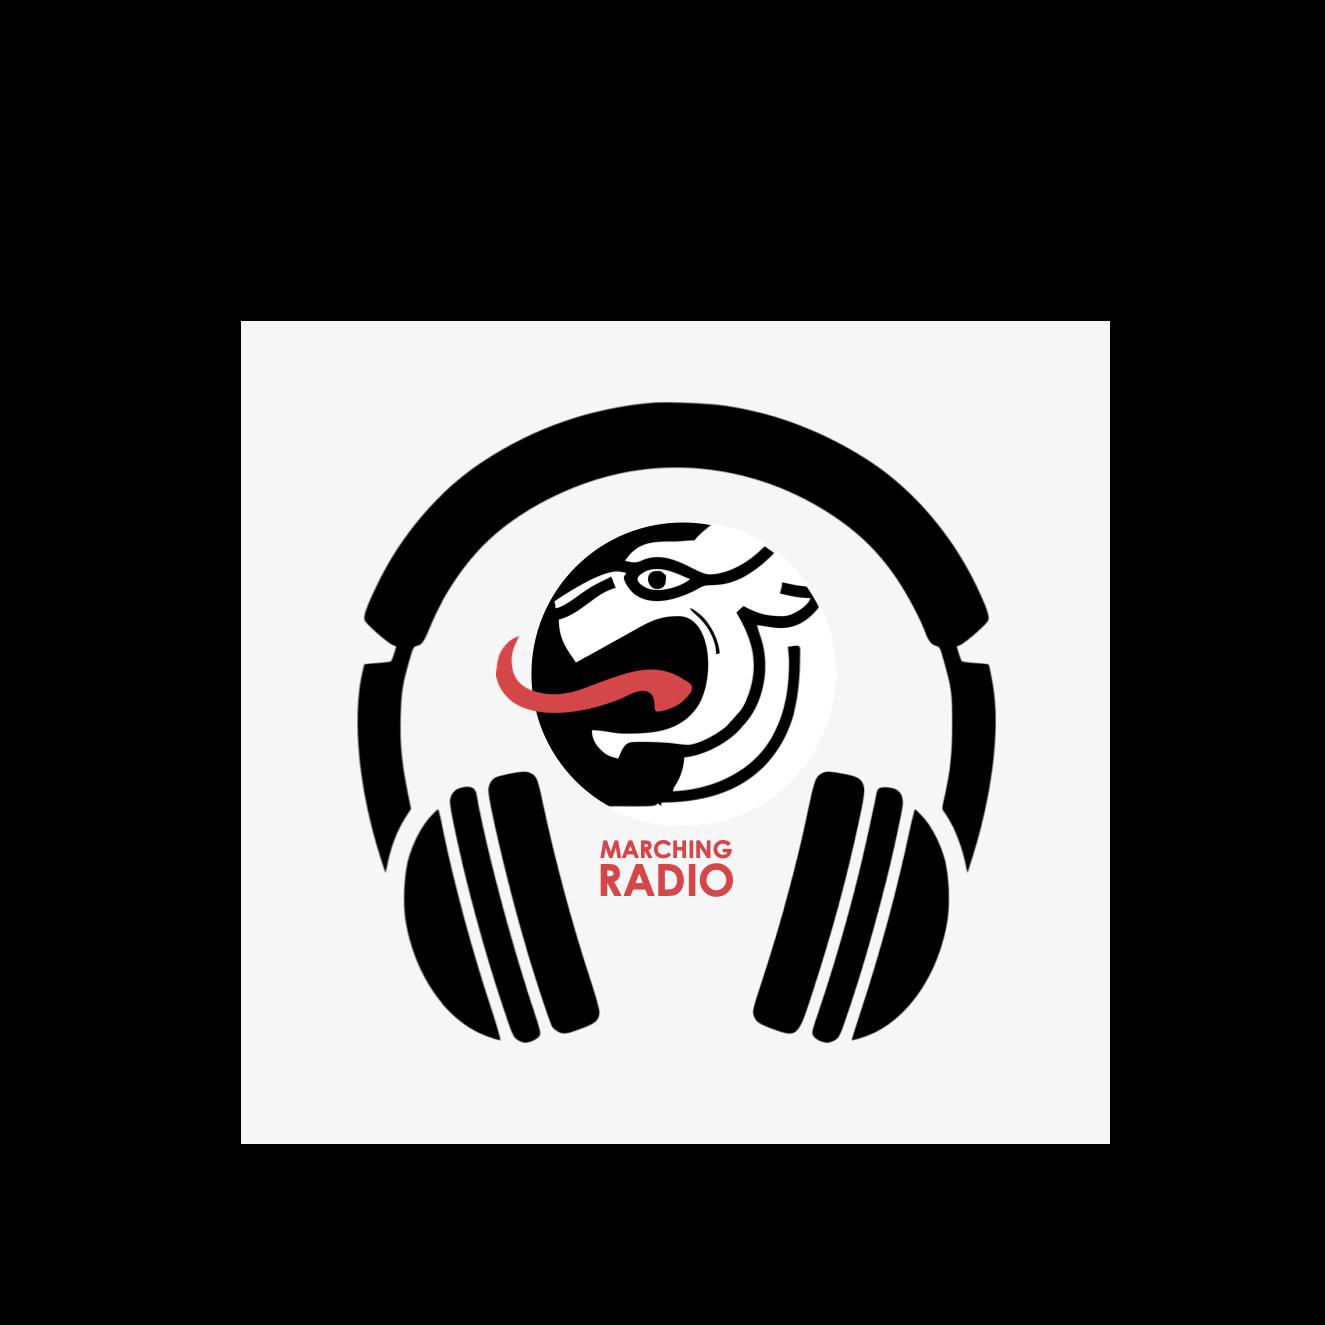 MARCHING RADIO